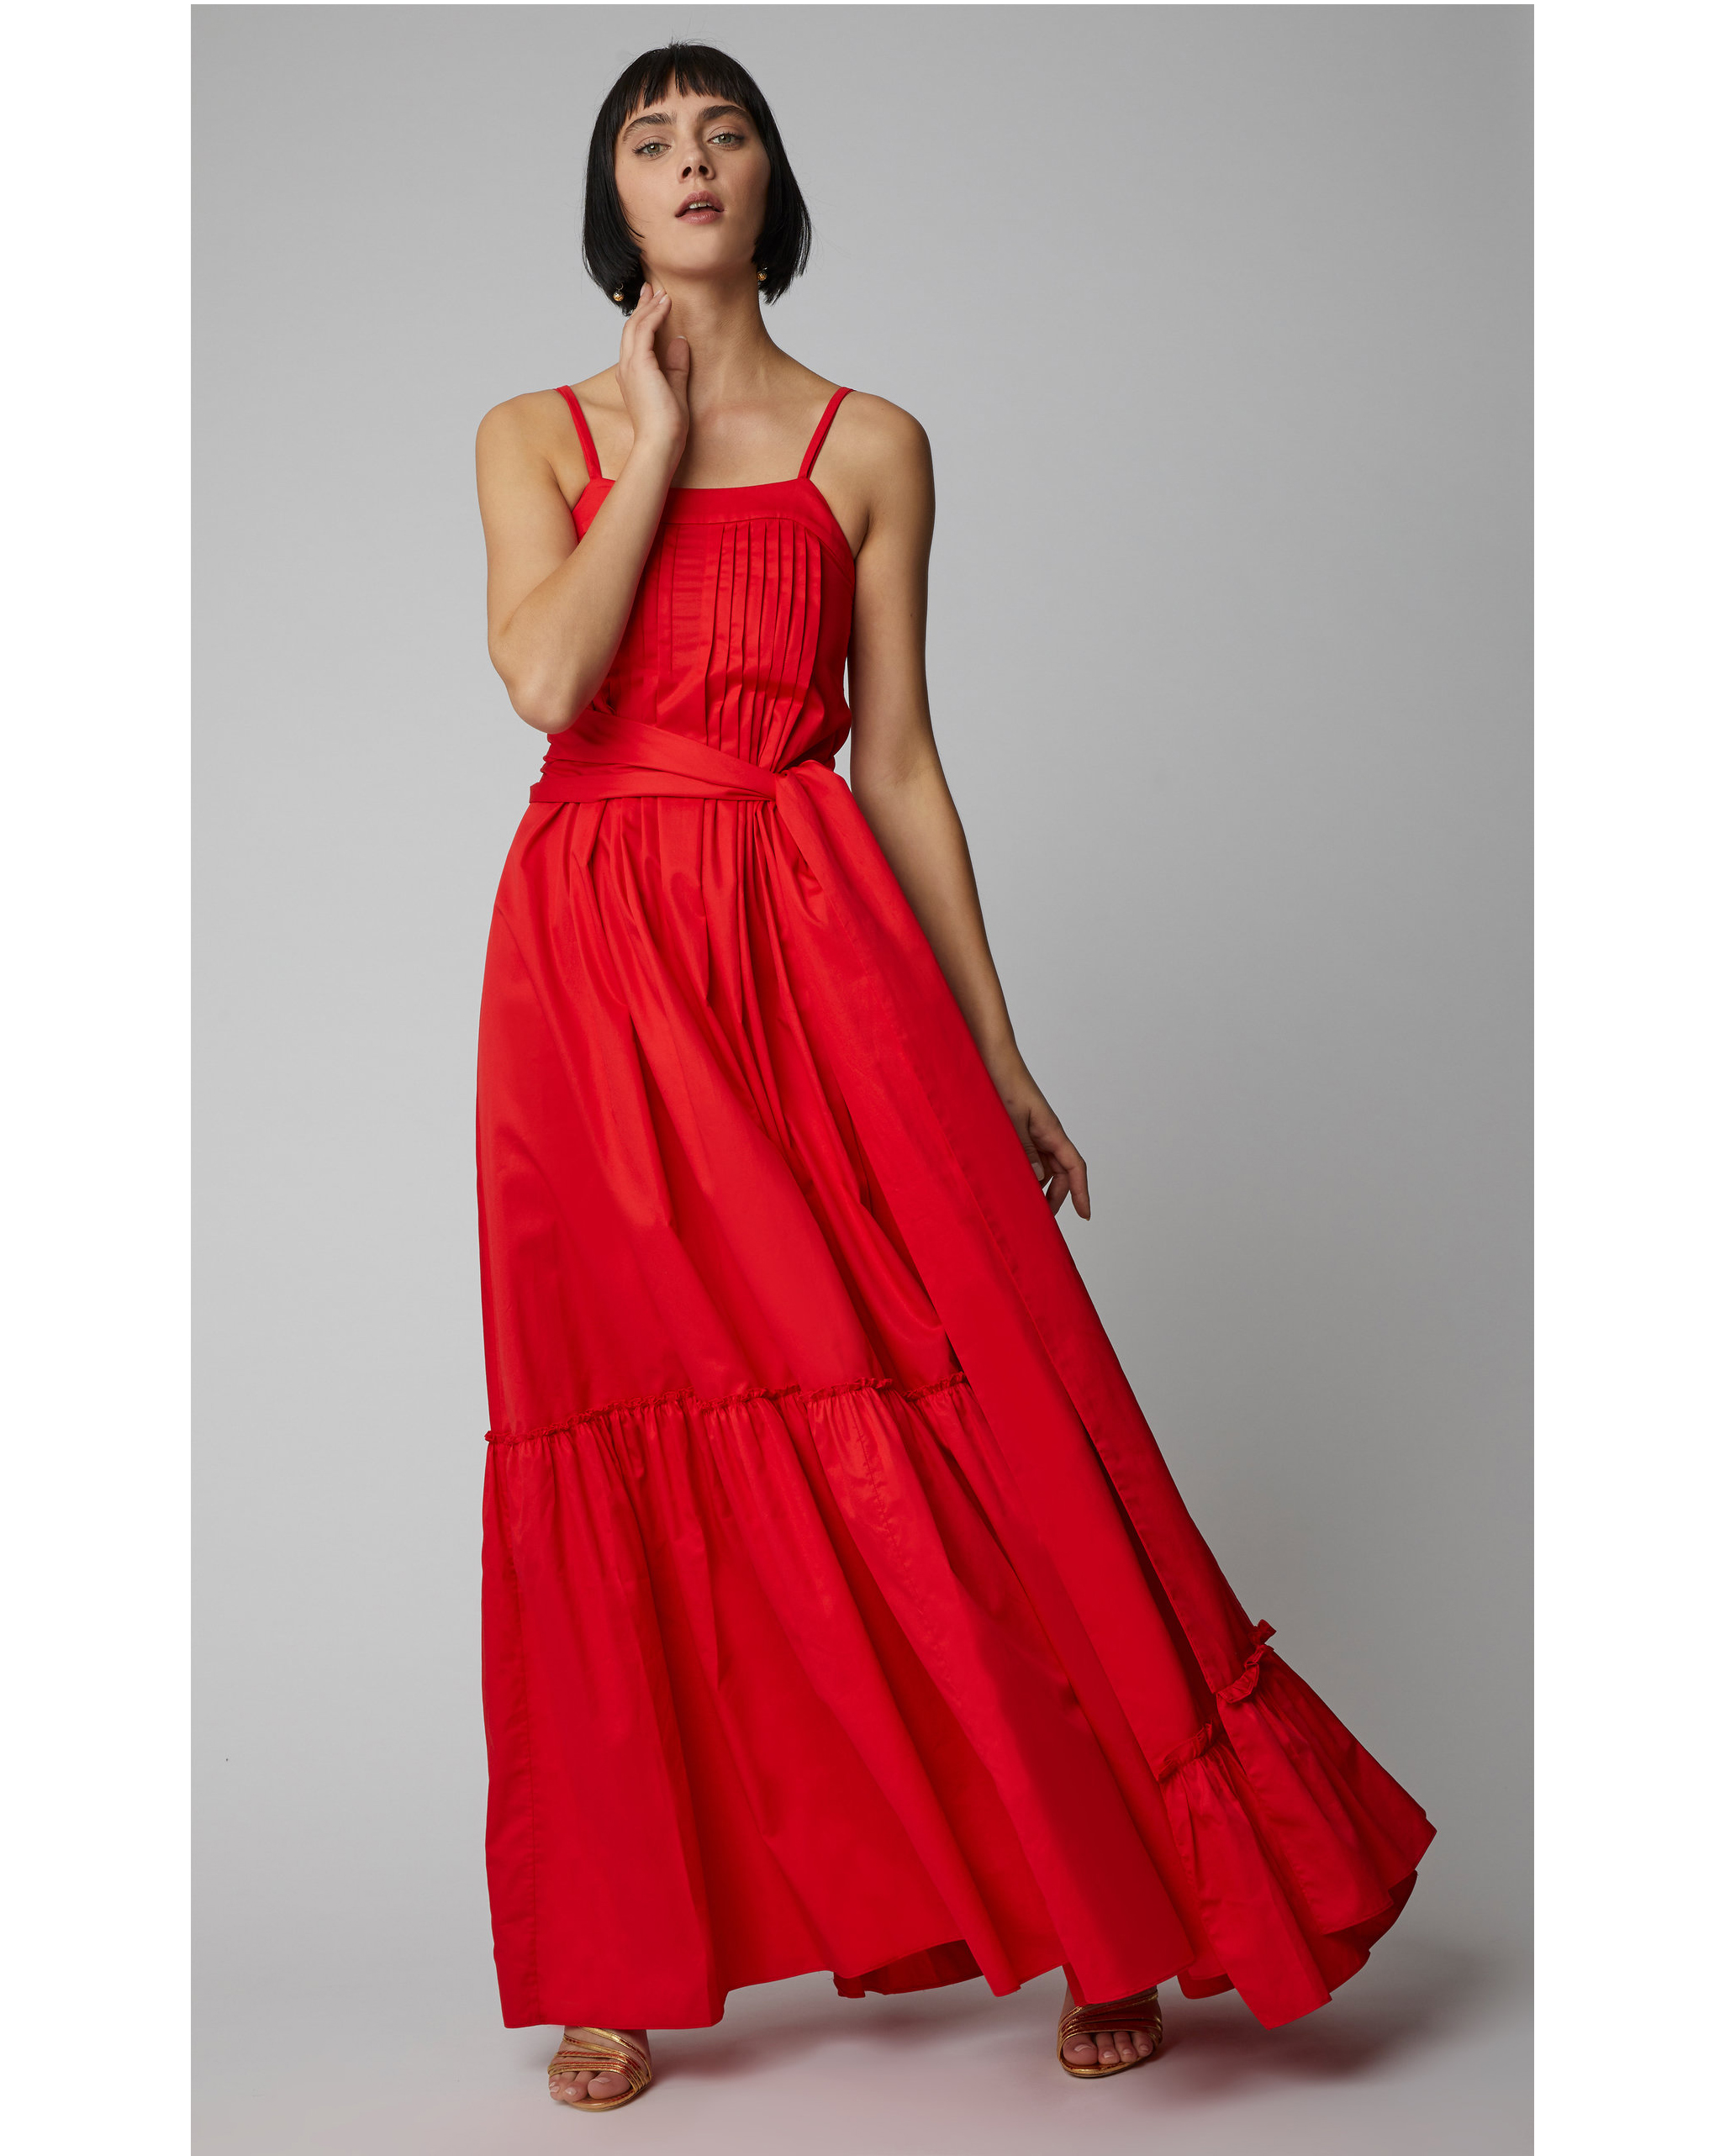 floor length red cotton dress